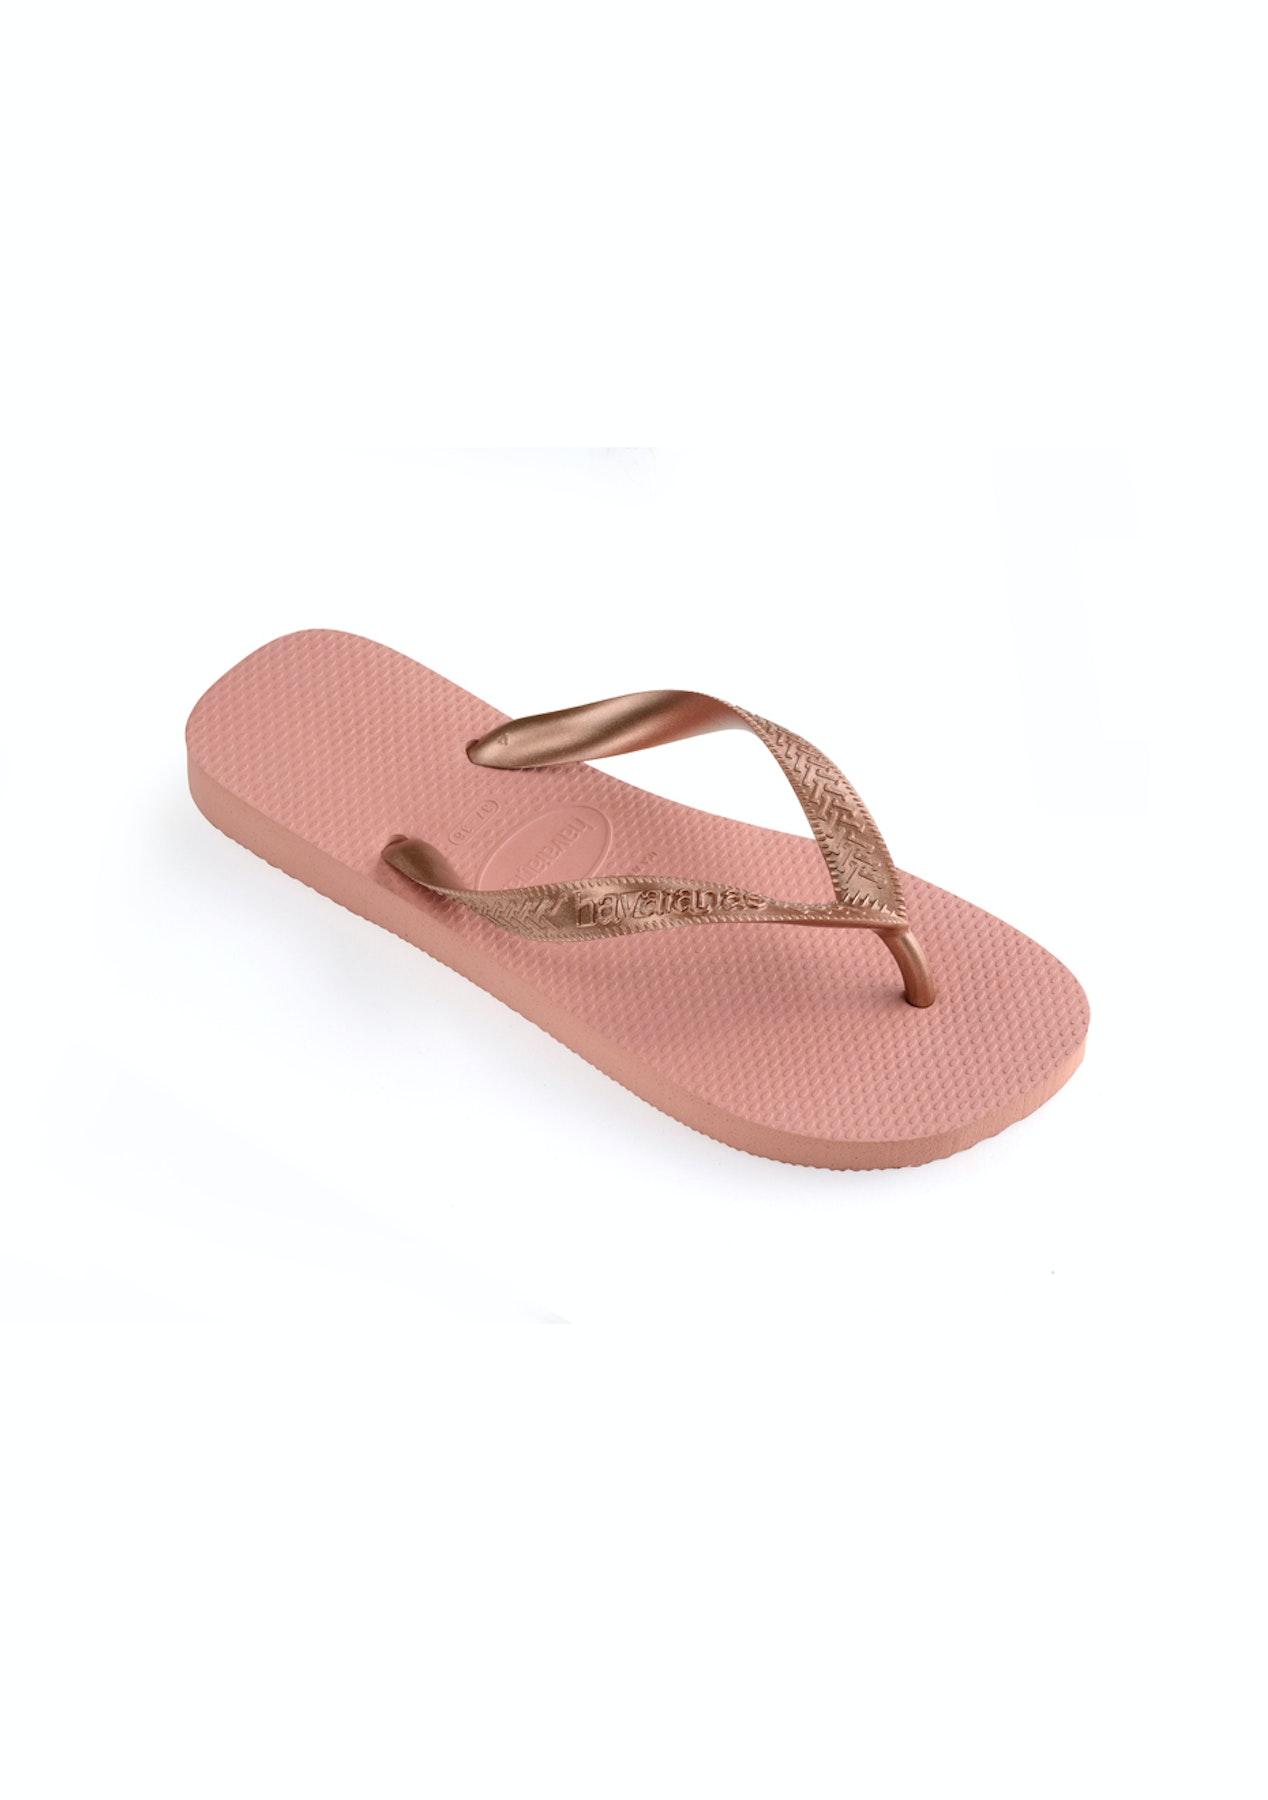 Havaianas - Top T 7939 - Rose Nude